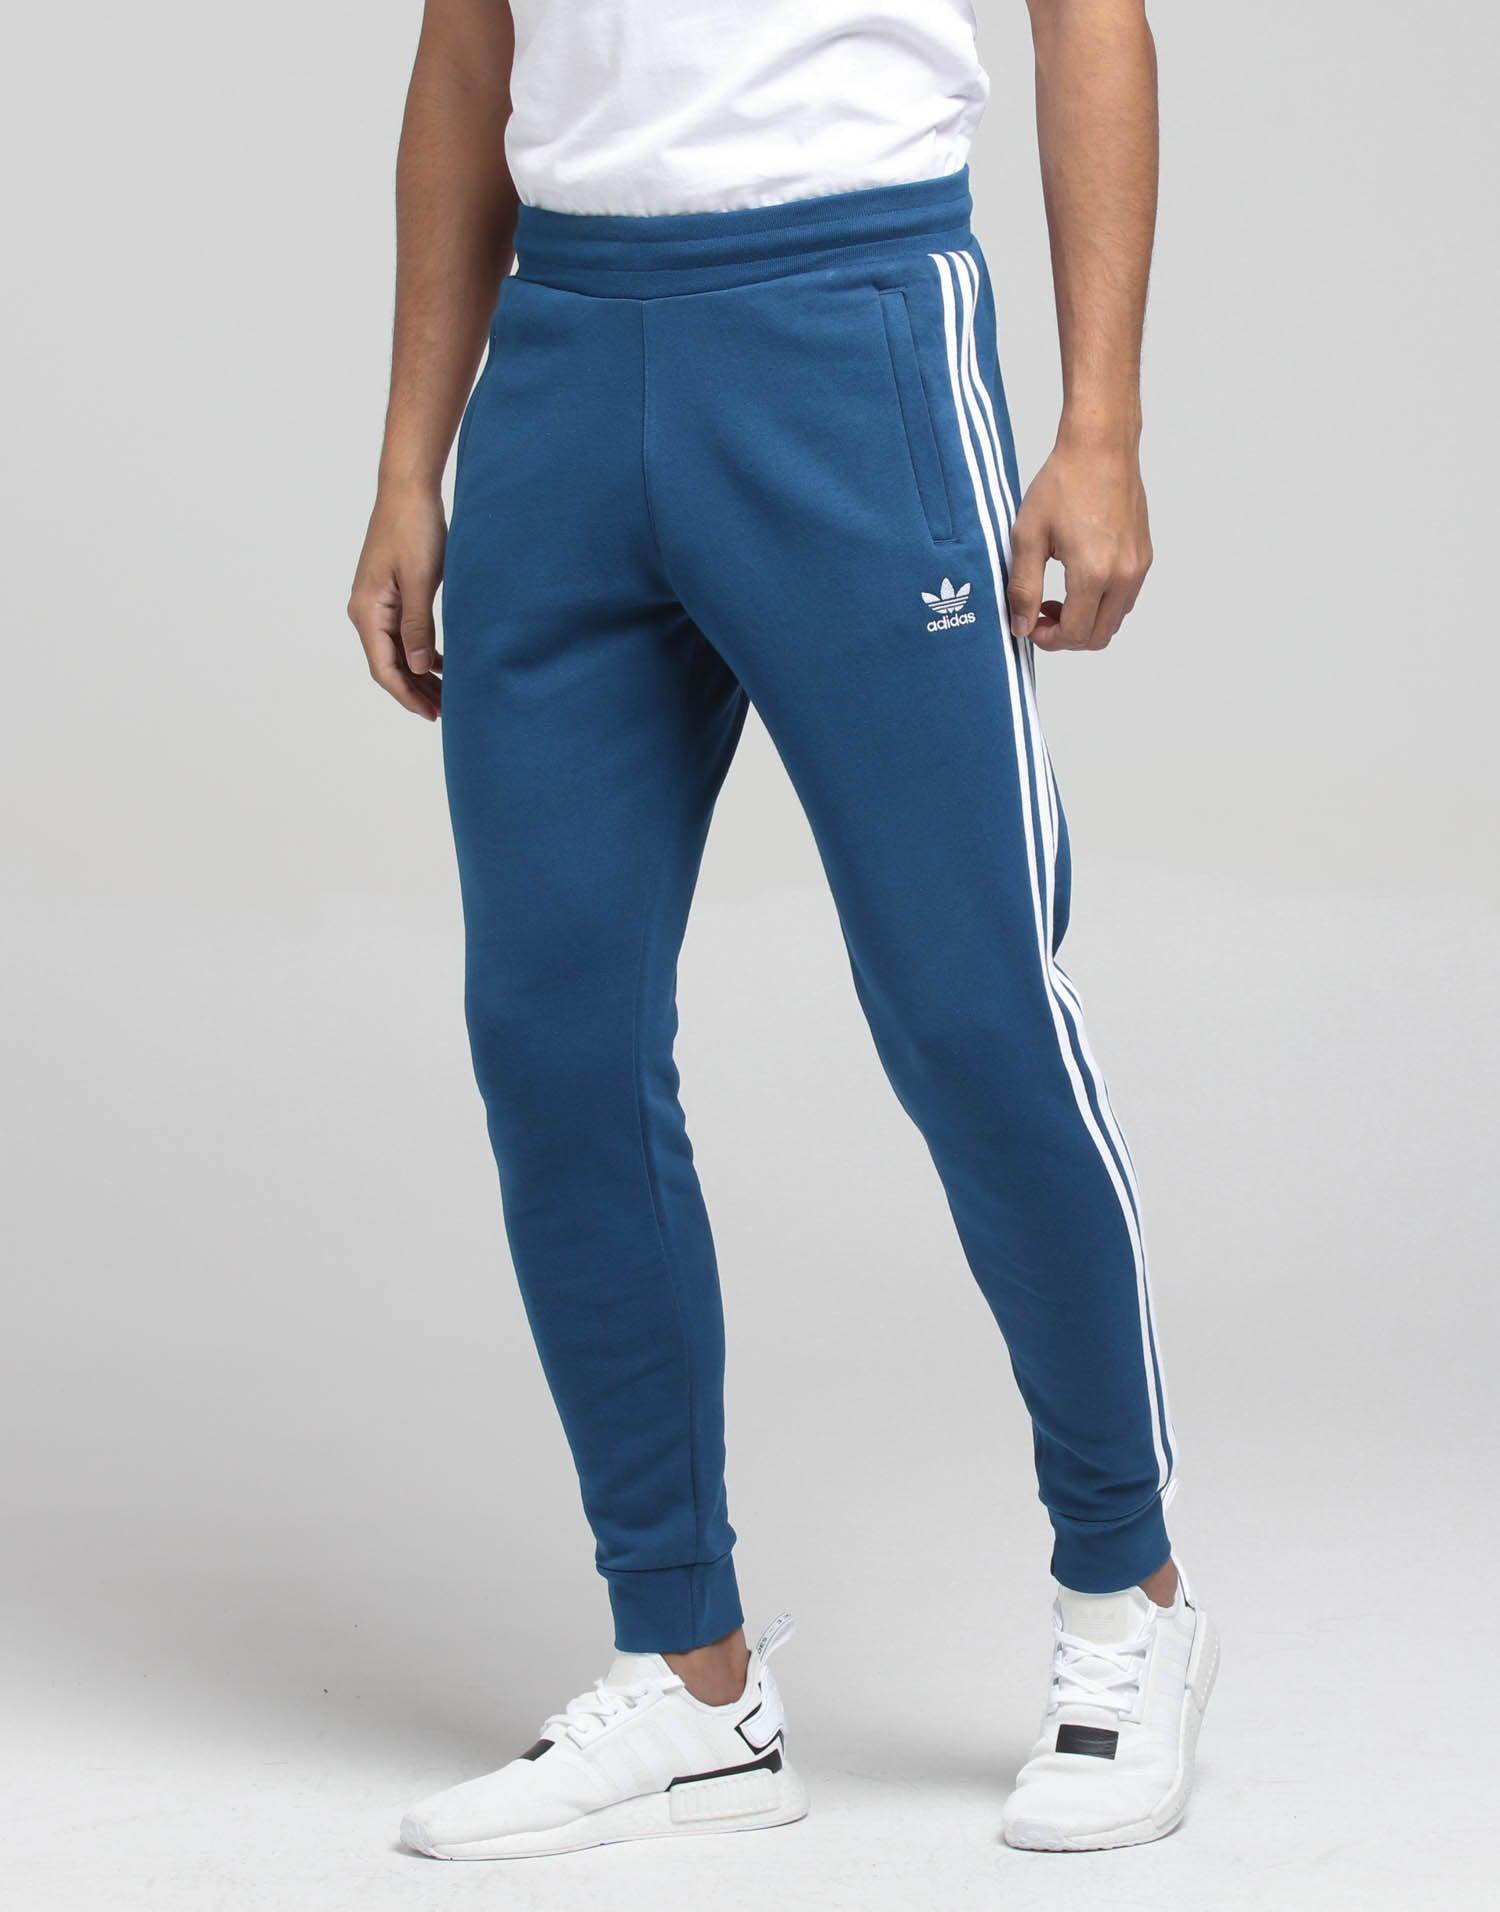 Adidas 3 Stripe Pant Marine Blue